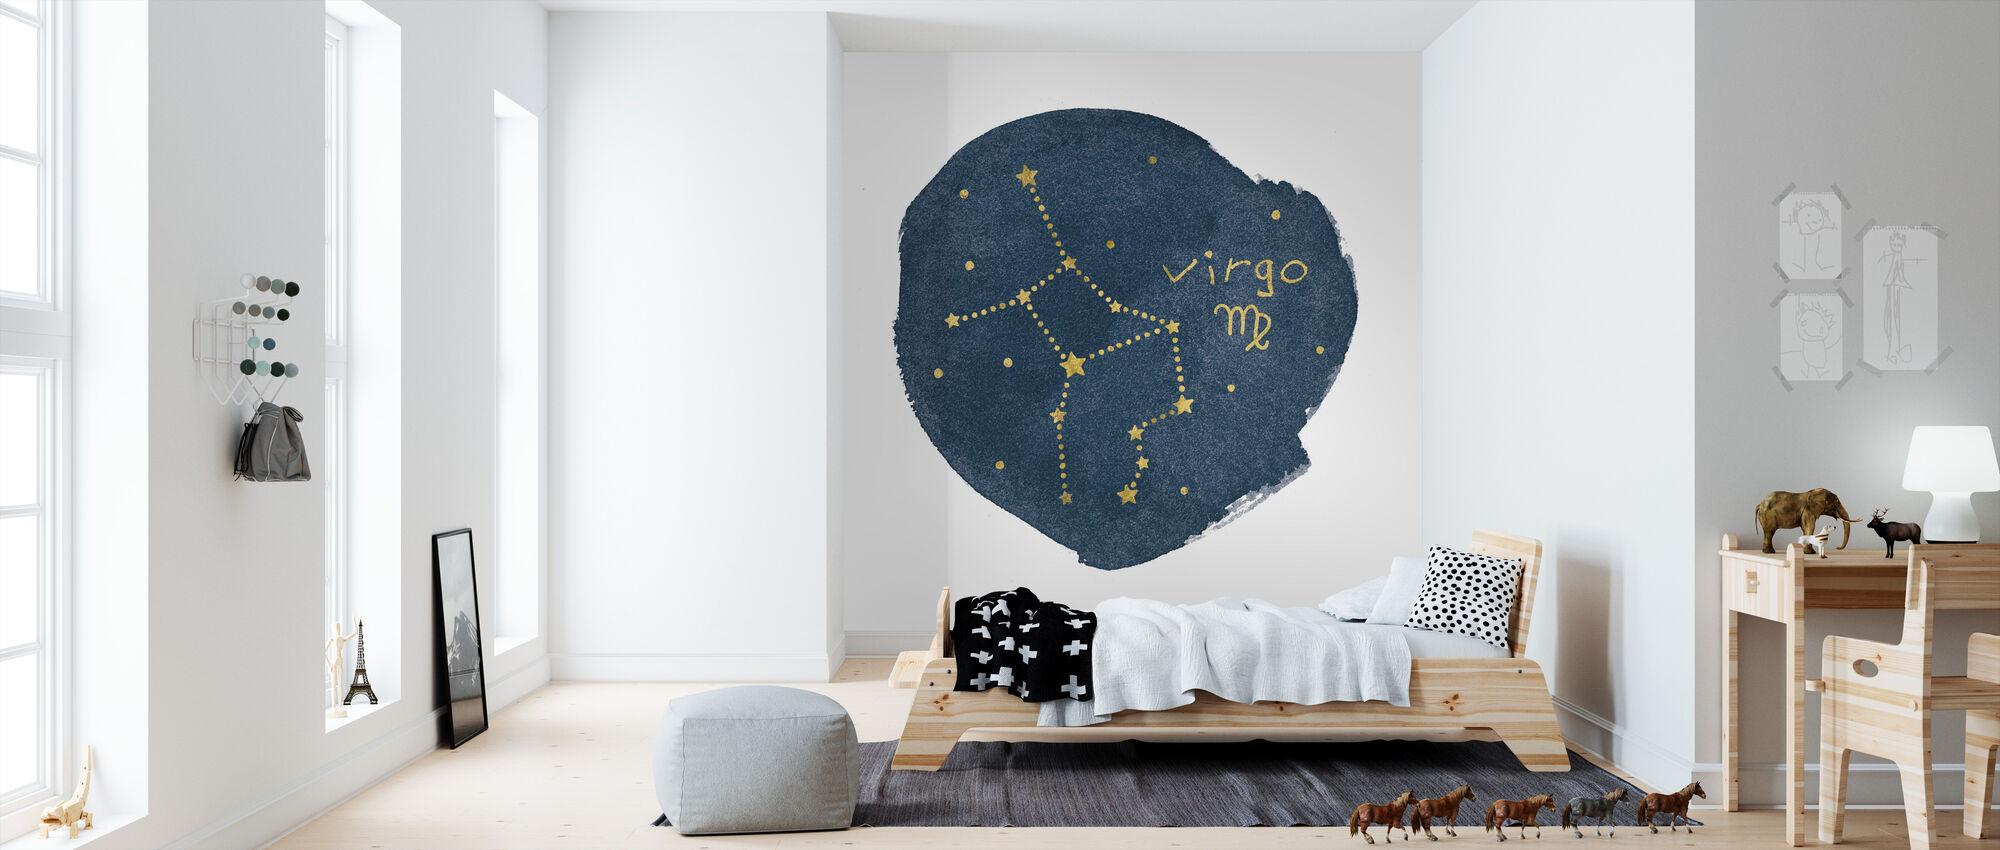 Horoscoop Maagd - Behang - Kinderkamer